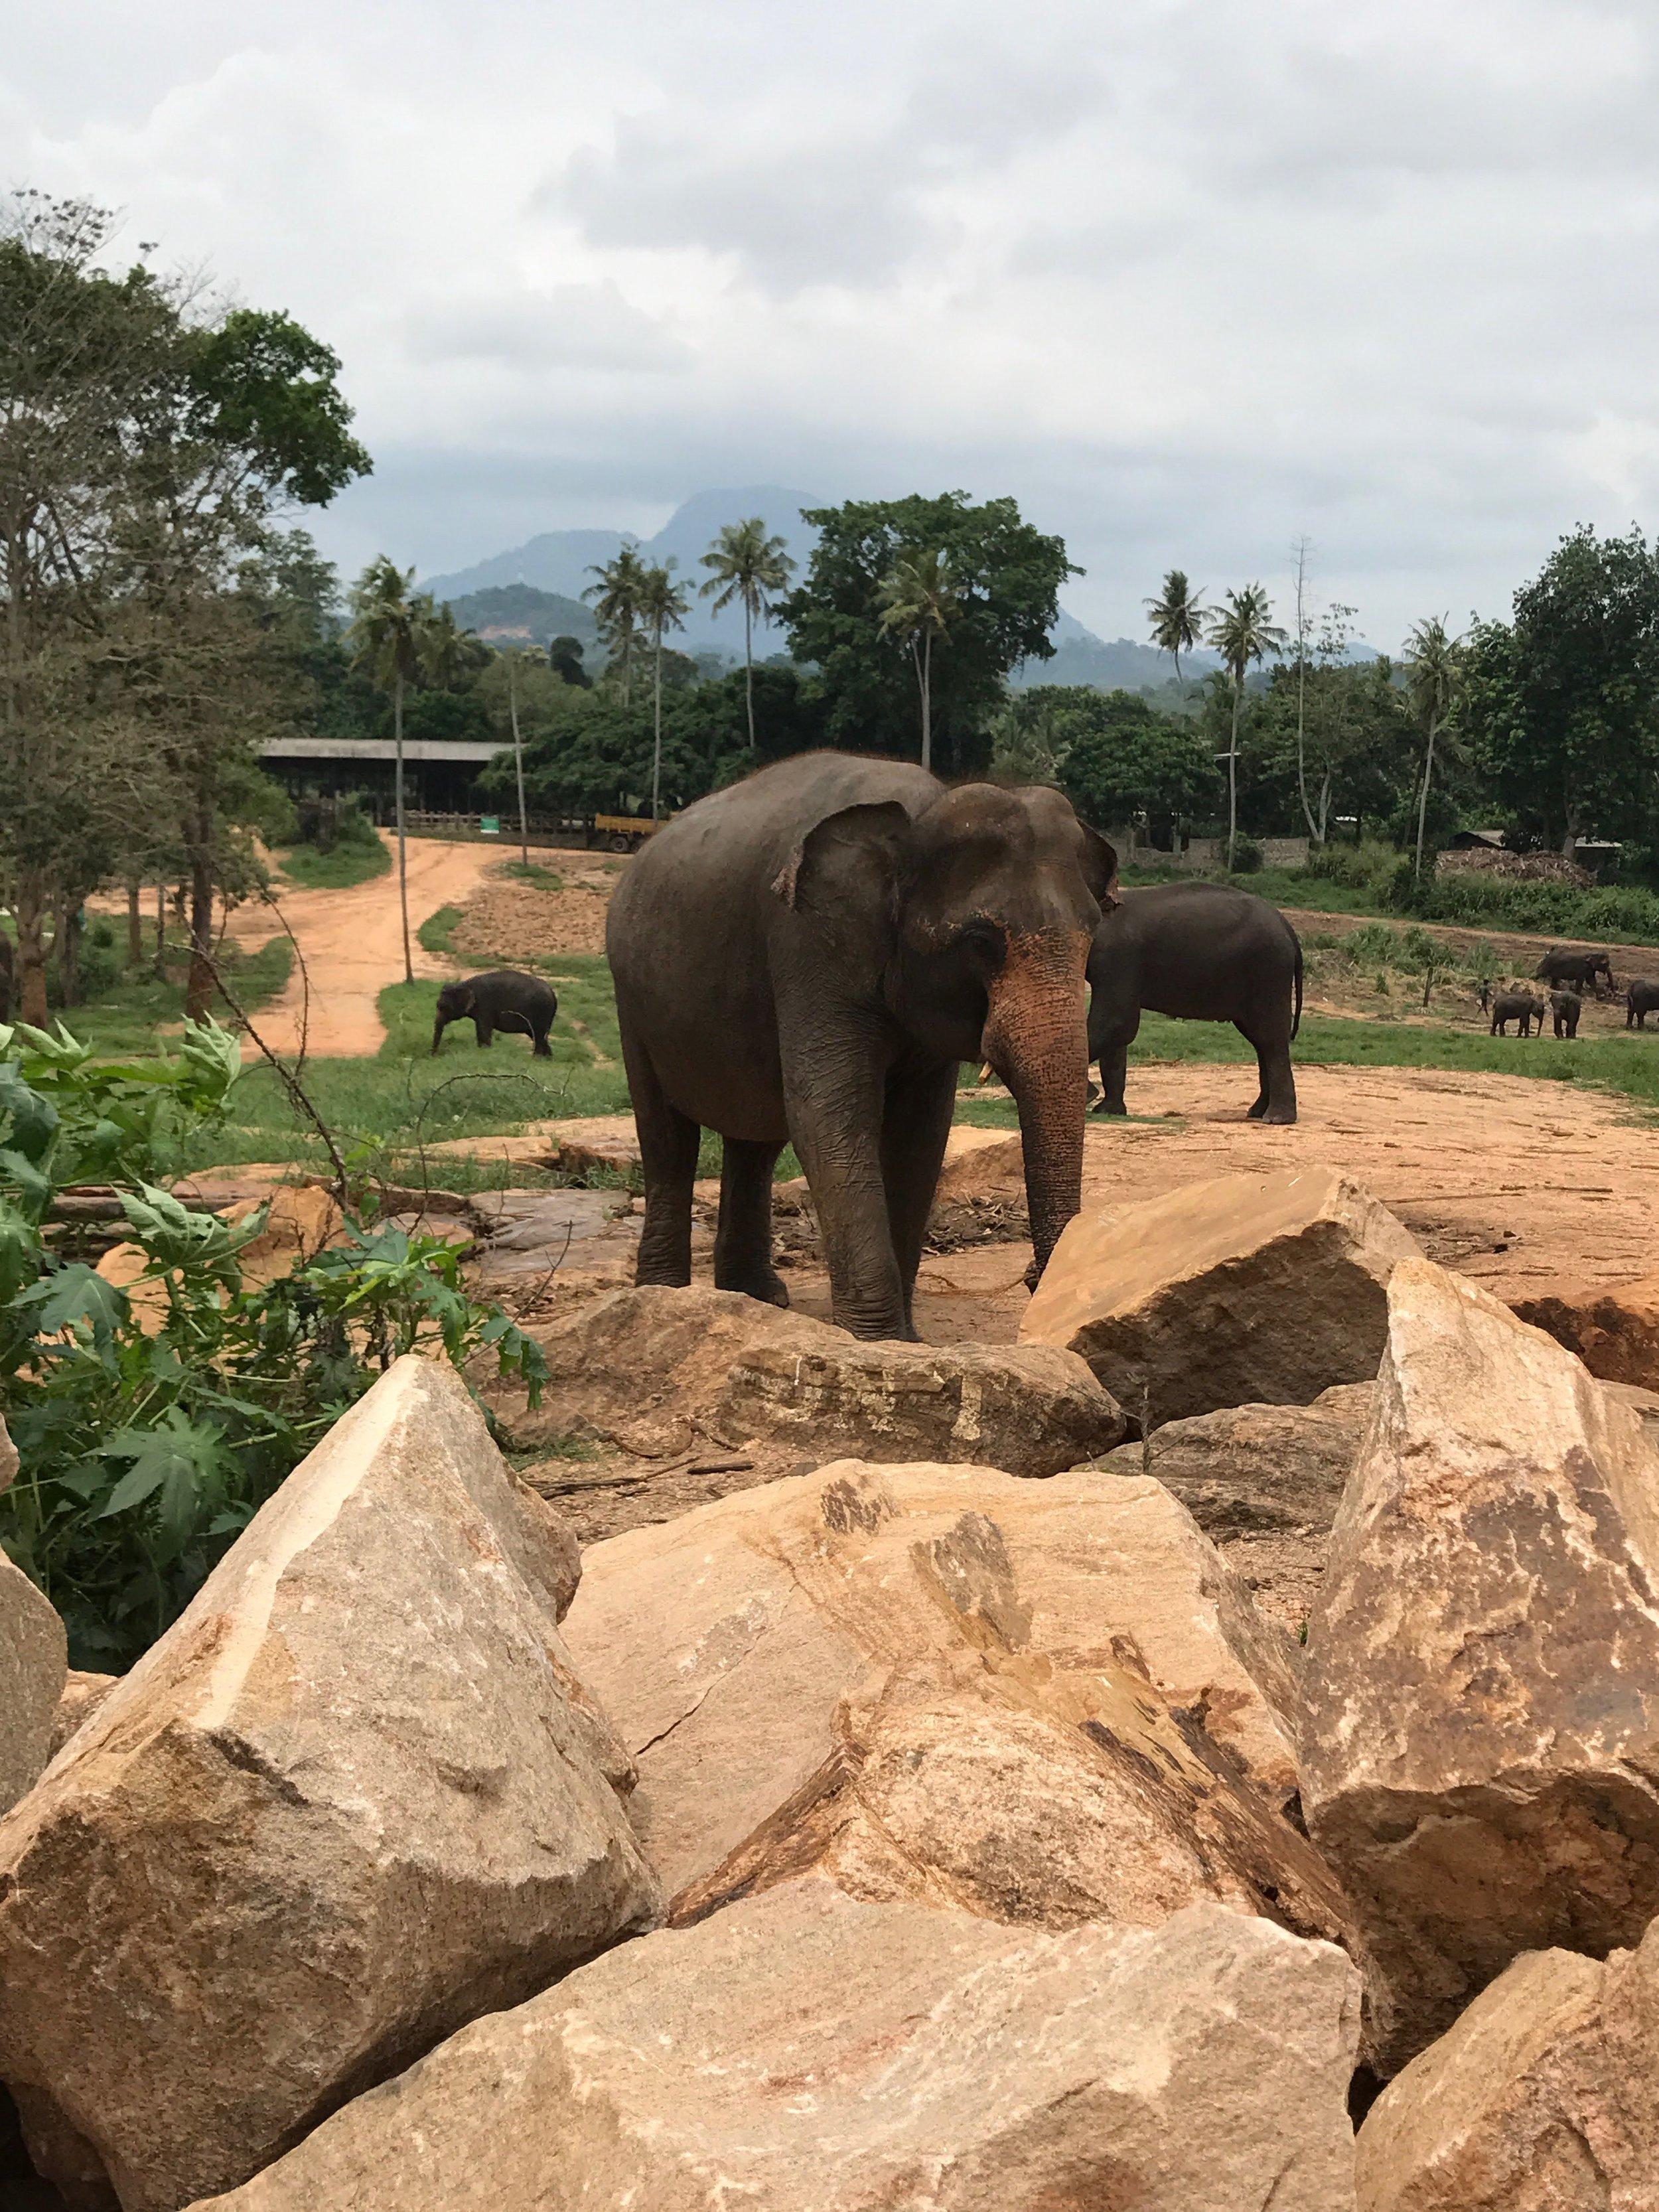 invite-to-paradise-maldives-sri-lanka-specialists-experts-travel-agent-tour-operator-customer-feedback-lucas-emily-fenning-elephant-orphanage-3.jpg